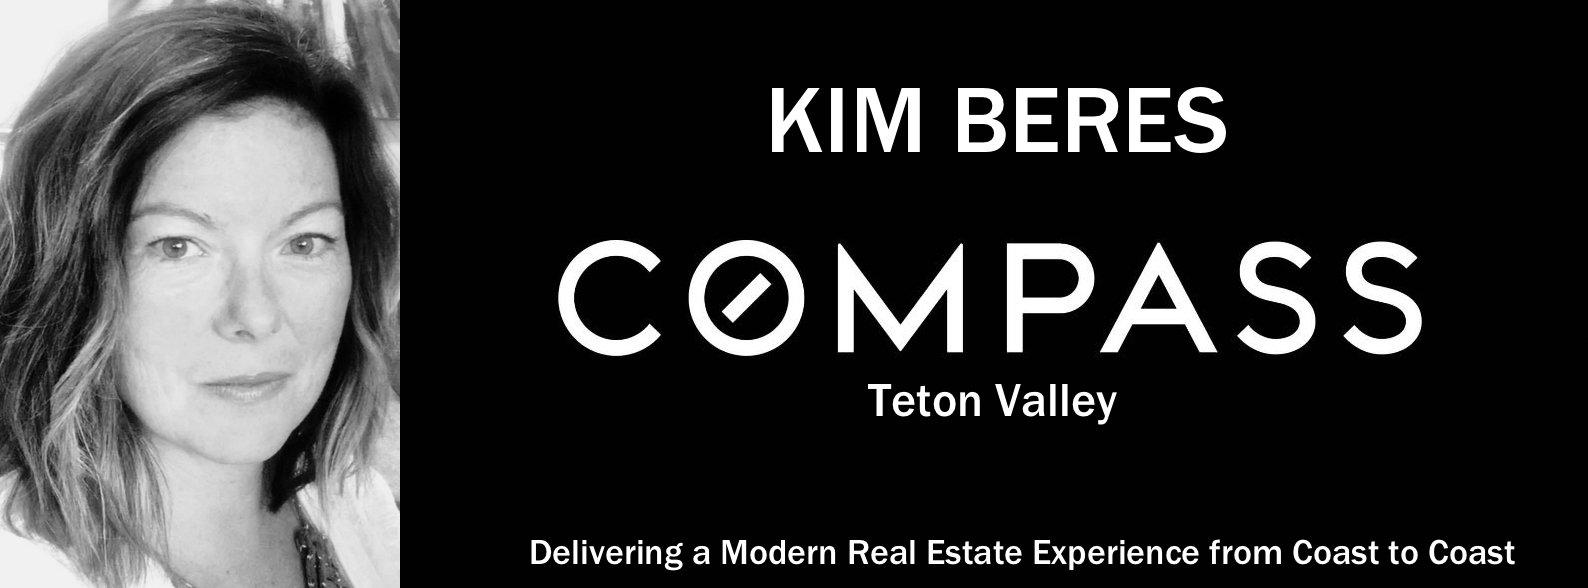 Compass Real Estate – Kim Beres